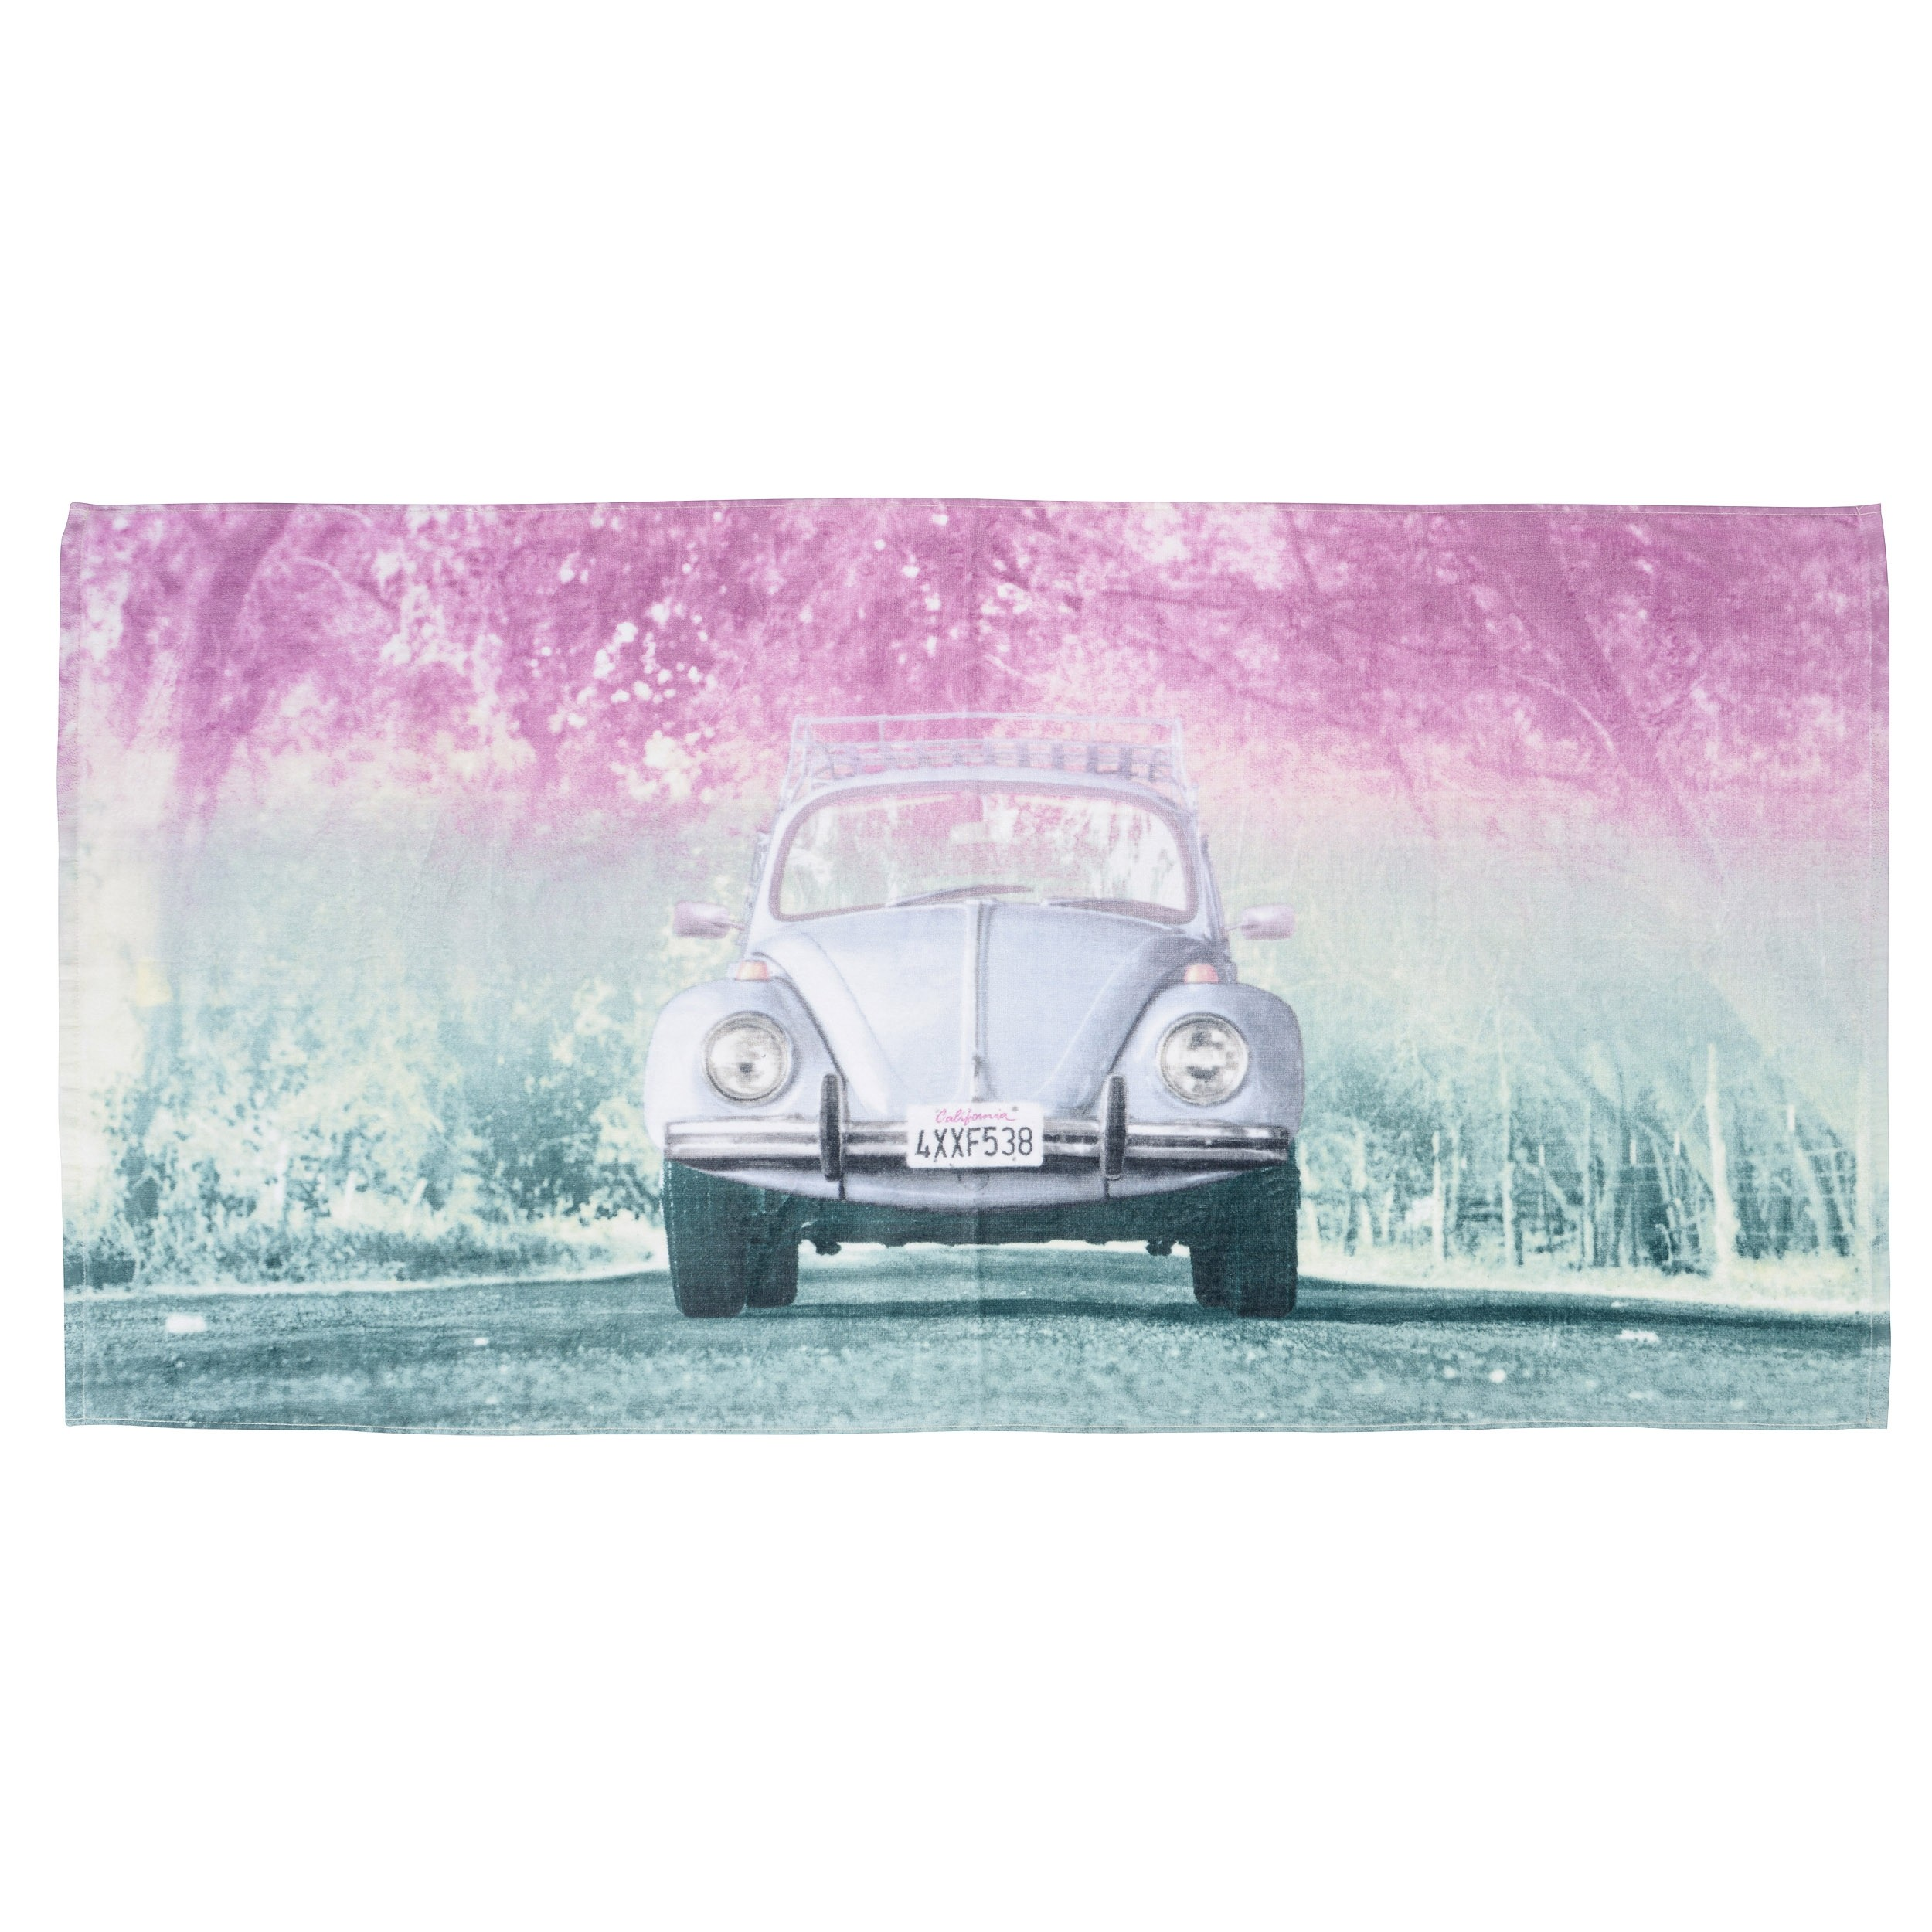 VW - L - TOWEL - MYRTLE - PINK